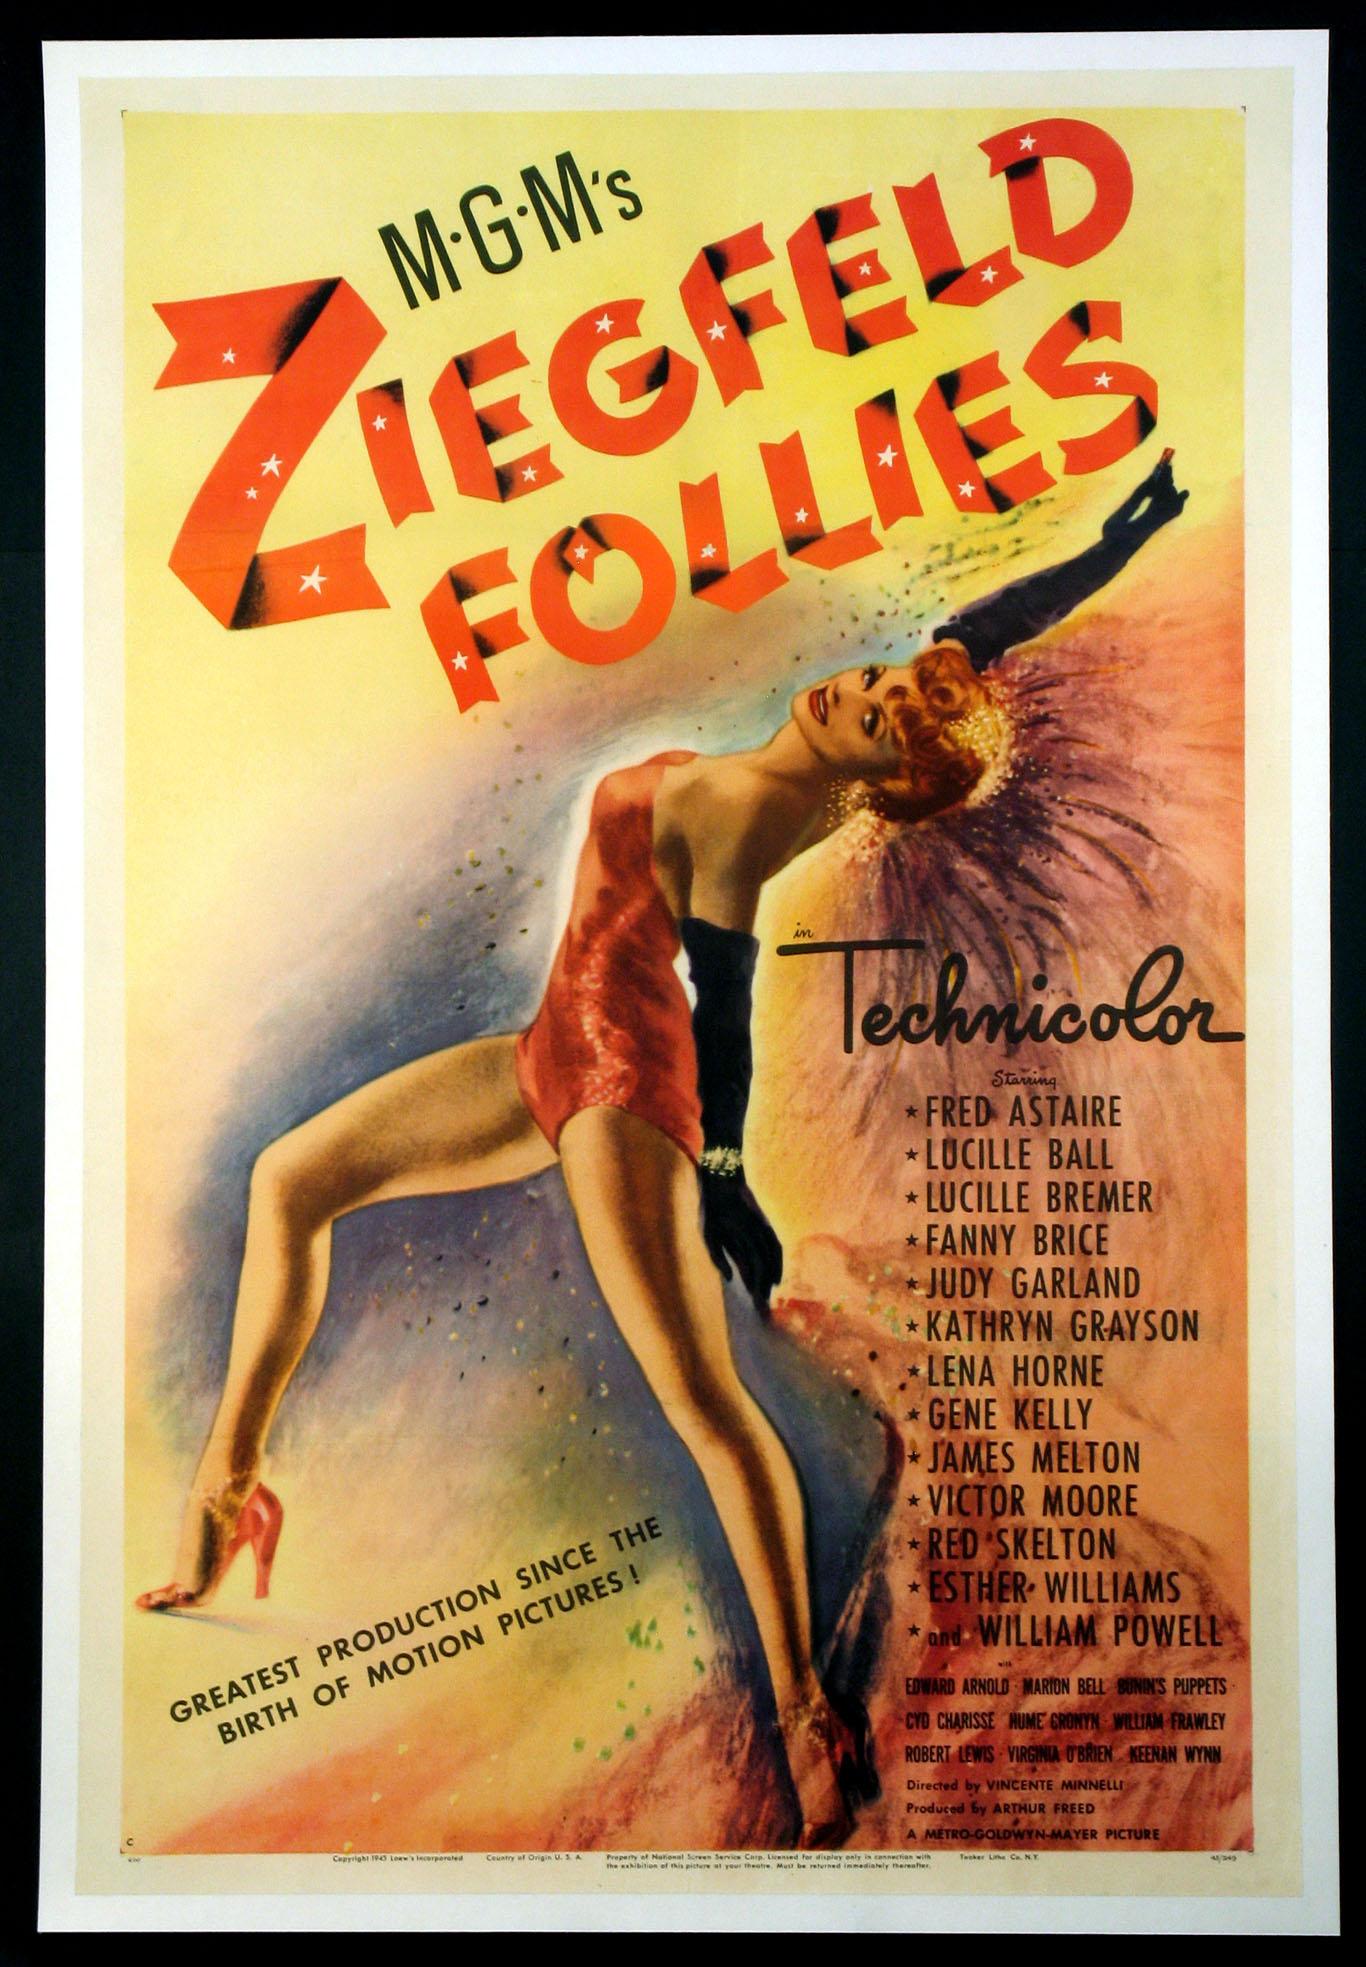 ziegfeld follies movie poster 1945